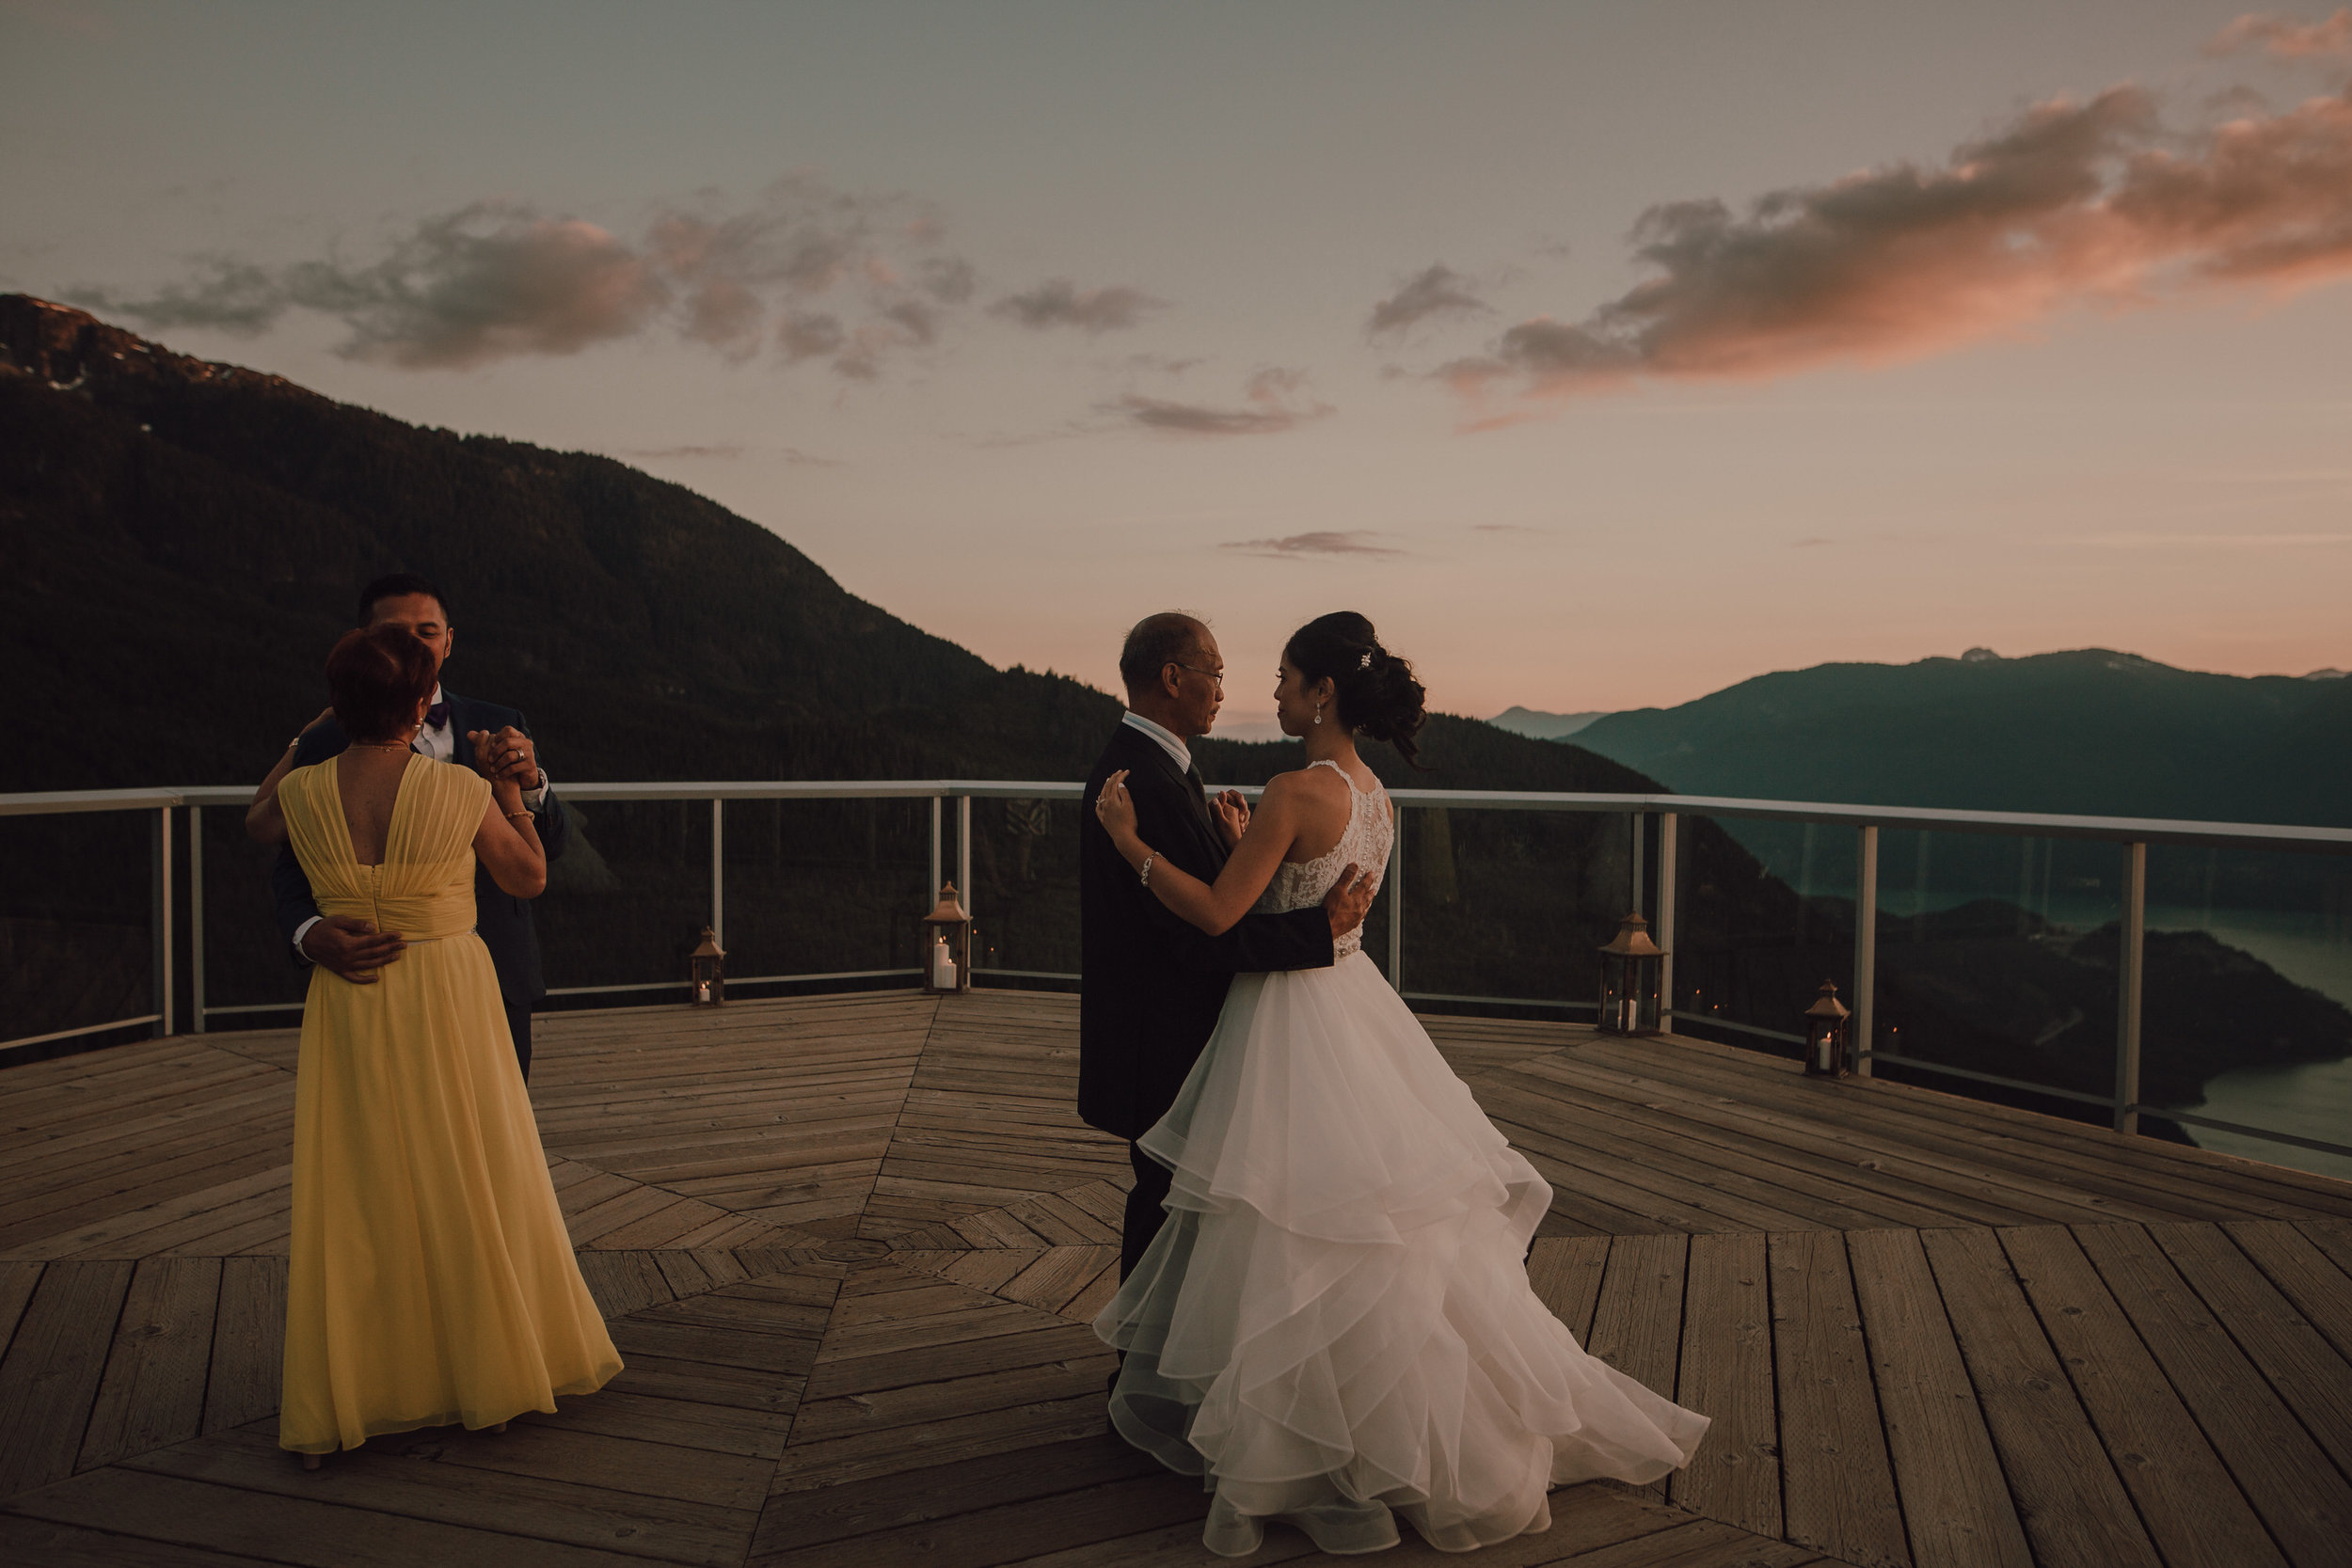 Squamish Wedding Photographer - Sea to Sky Gondola Wedding Photos -  Vancouver Wedding Photographer & Videographer - Sunshine Coast Wedding Photos - Sunshine Coast Wedding Photographer - Jennifer Picard Photography - IMG_5536.jpg